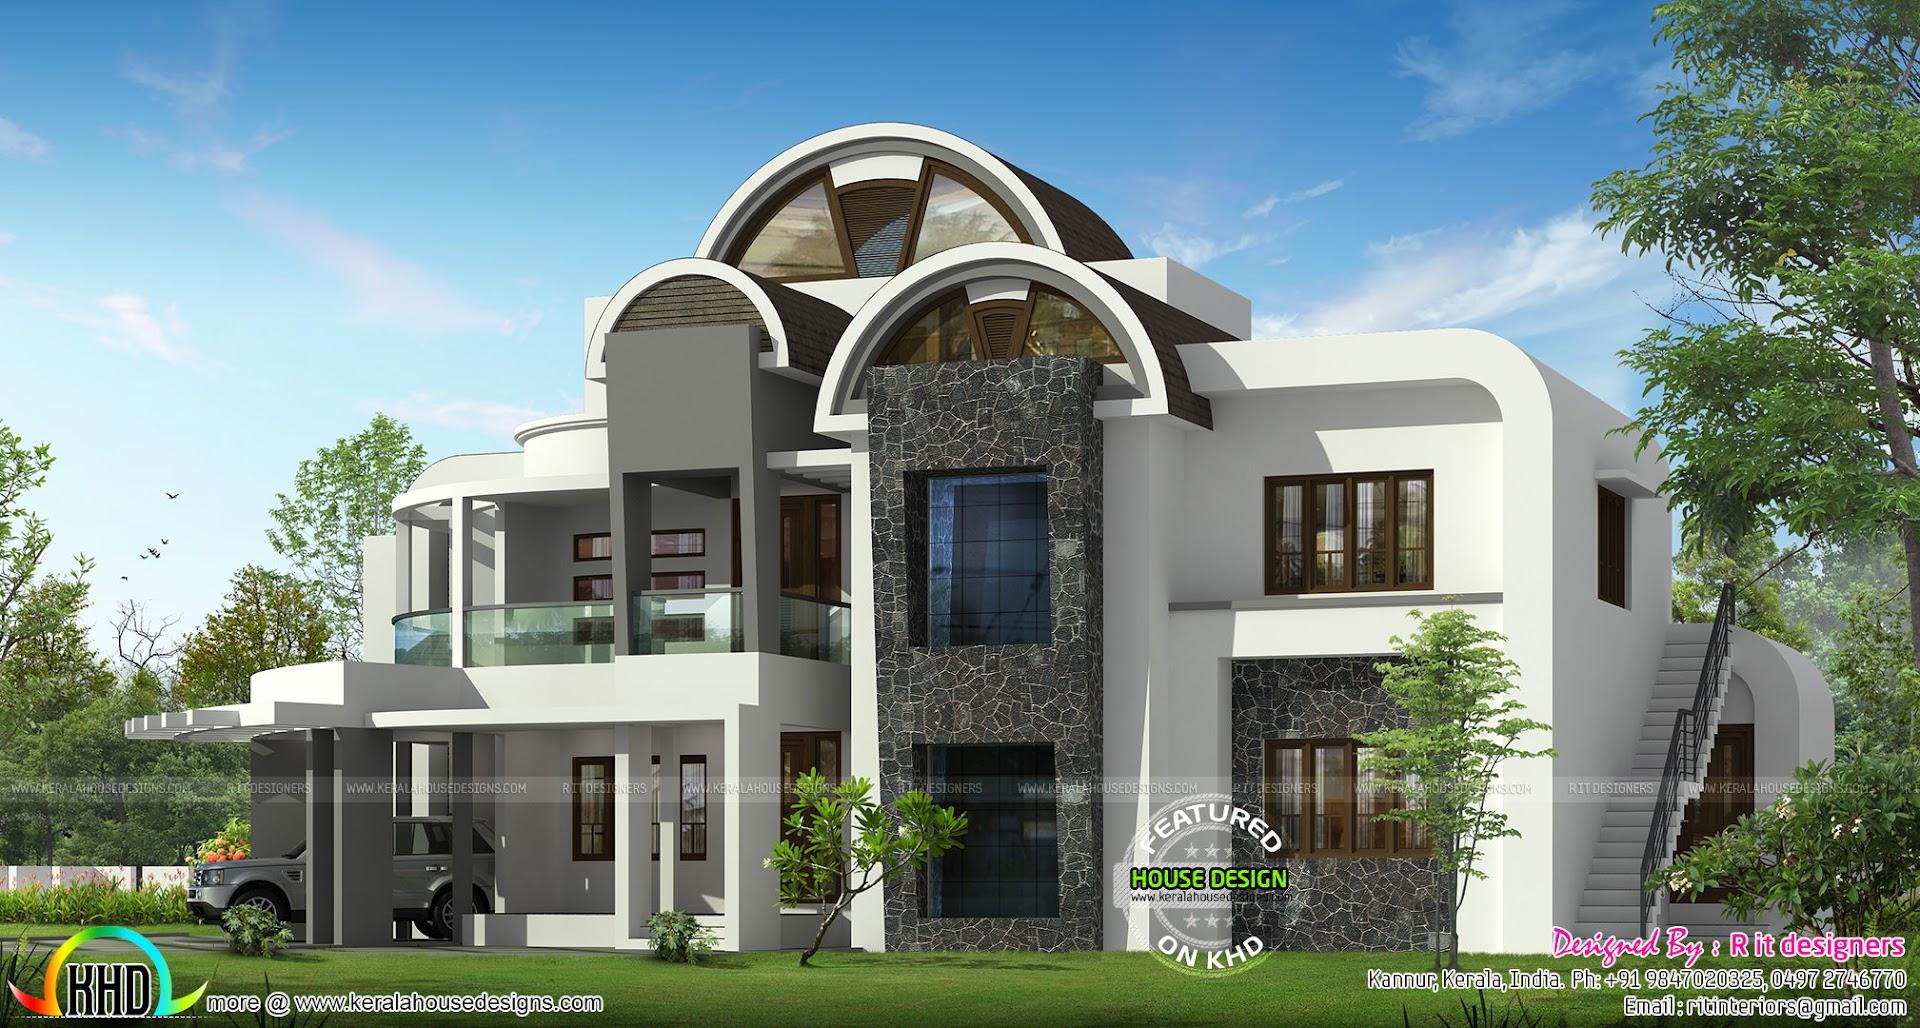 Round Homes Designs: Half Round Roof Unique House Design